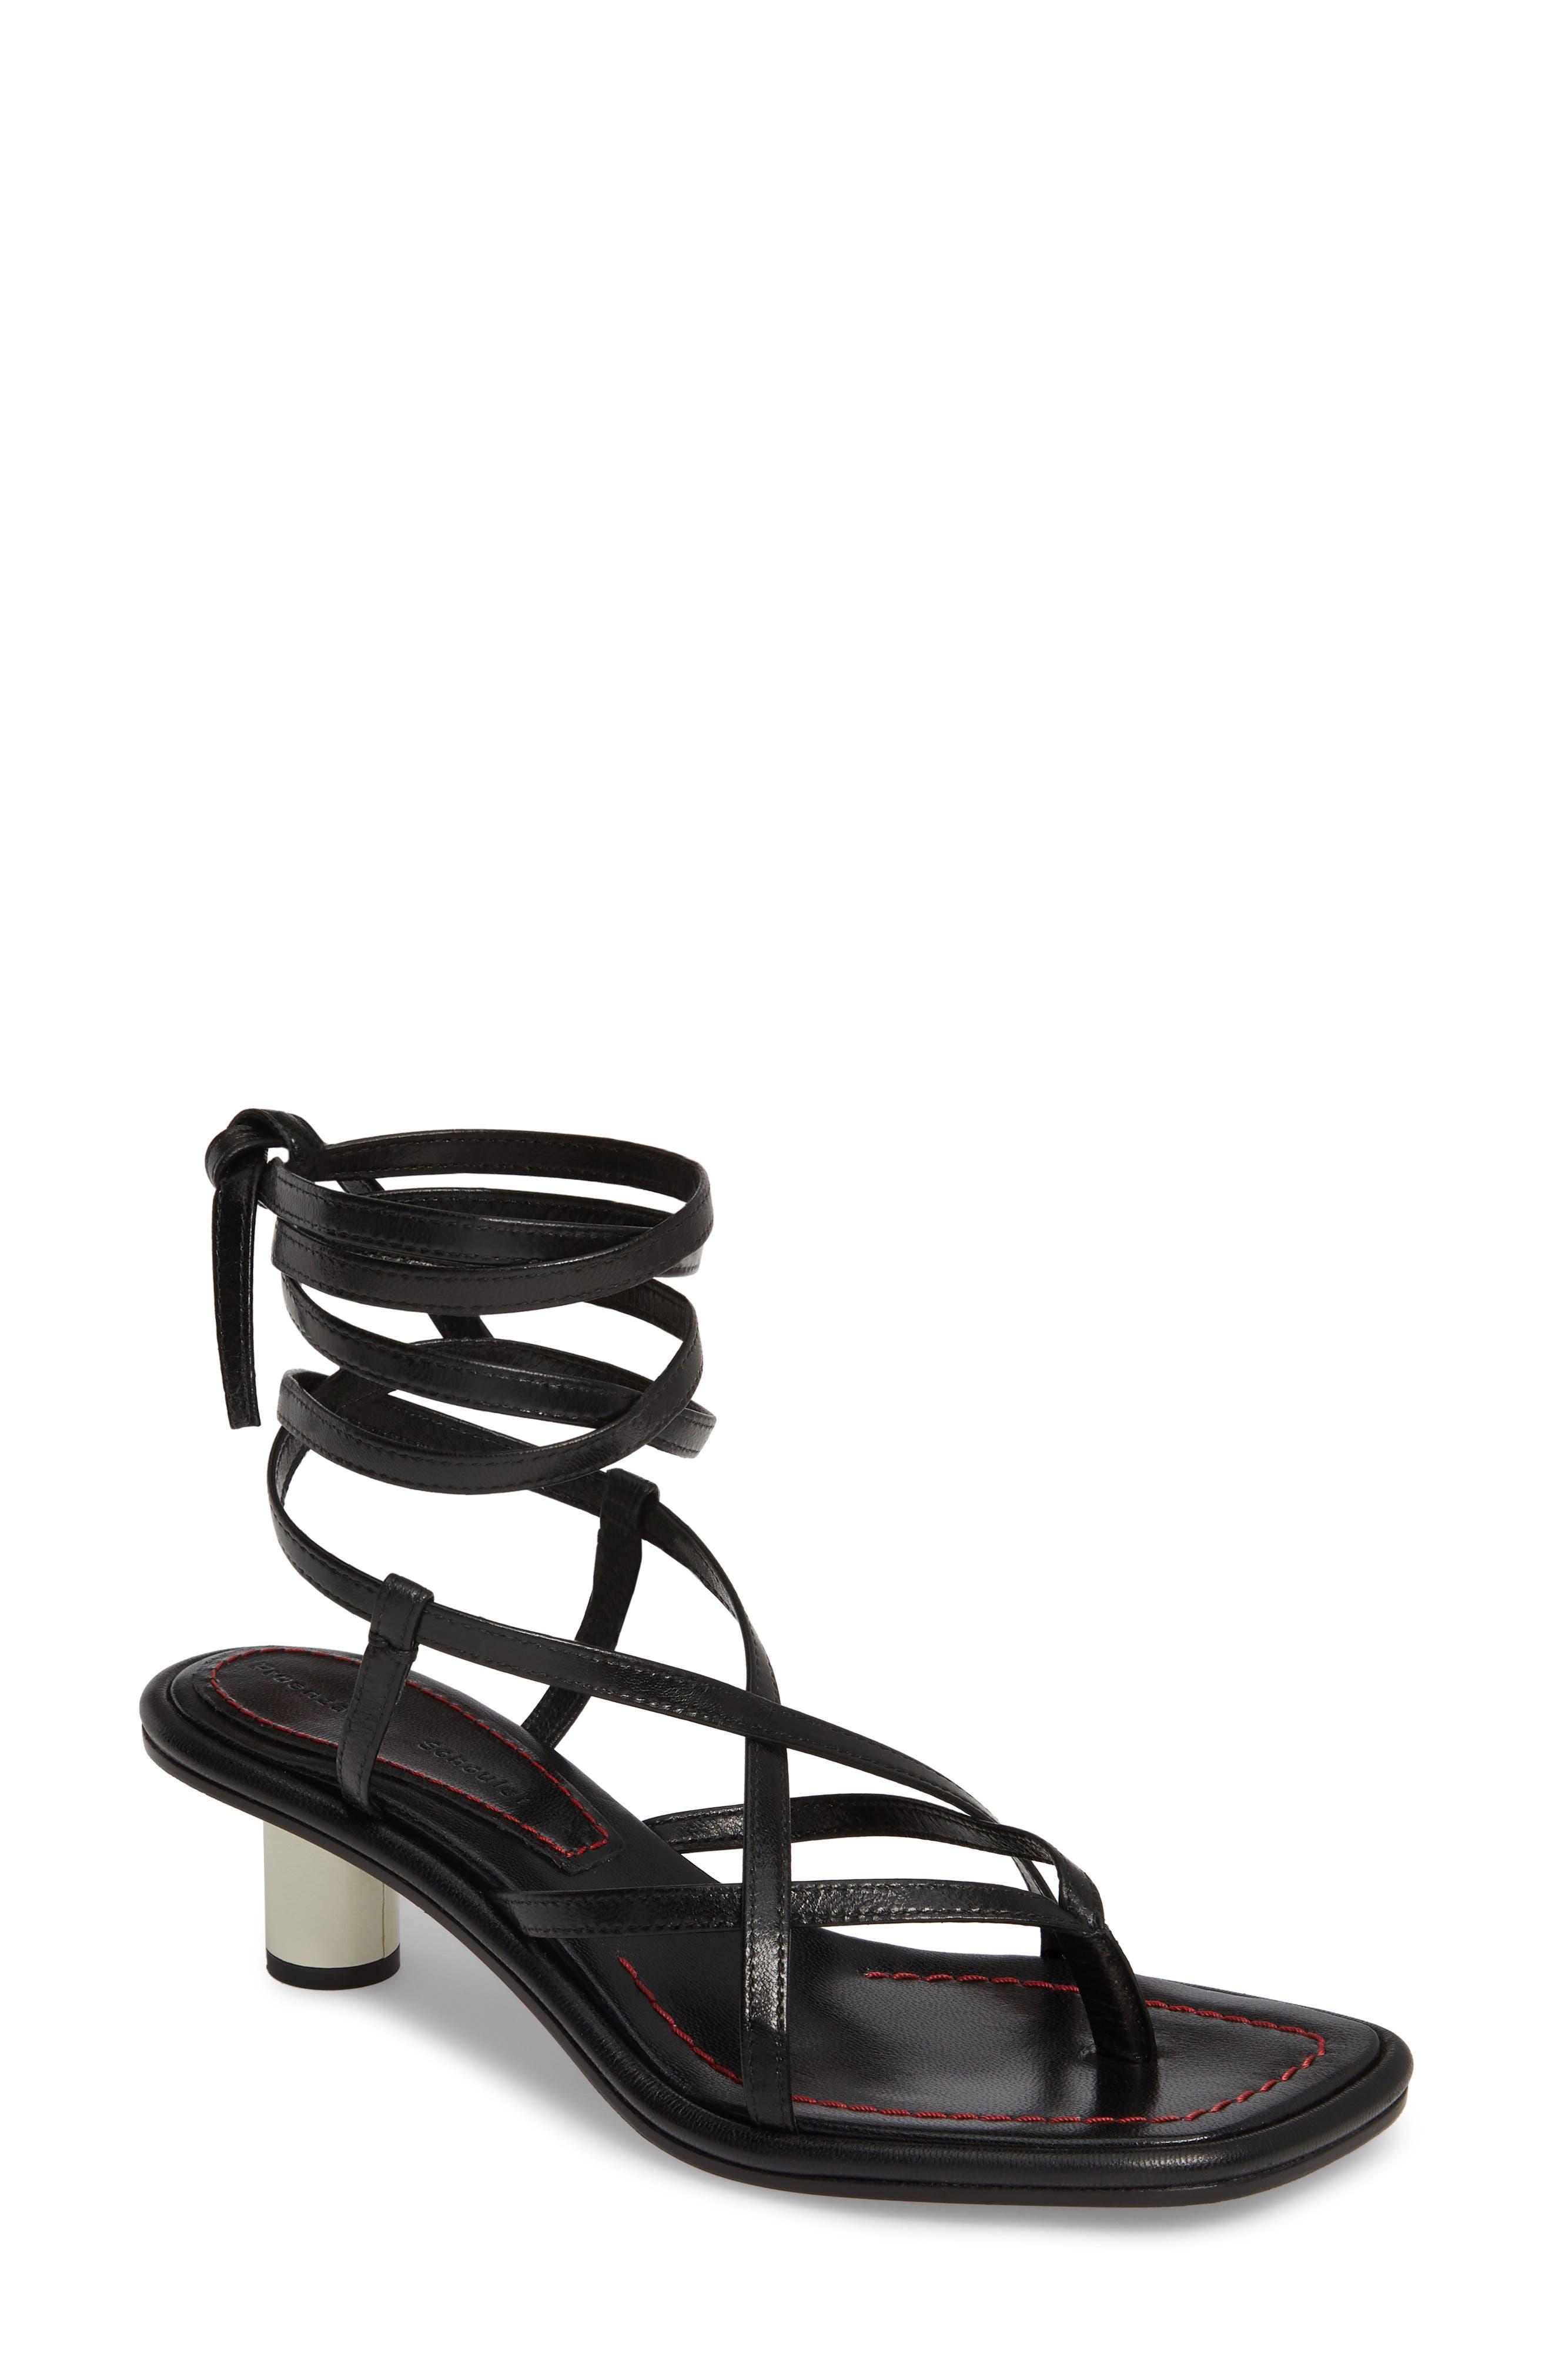 Wraparound Ankle Strap Sandal, Main, color, BLACK